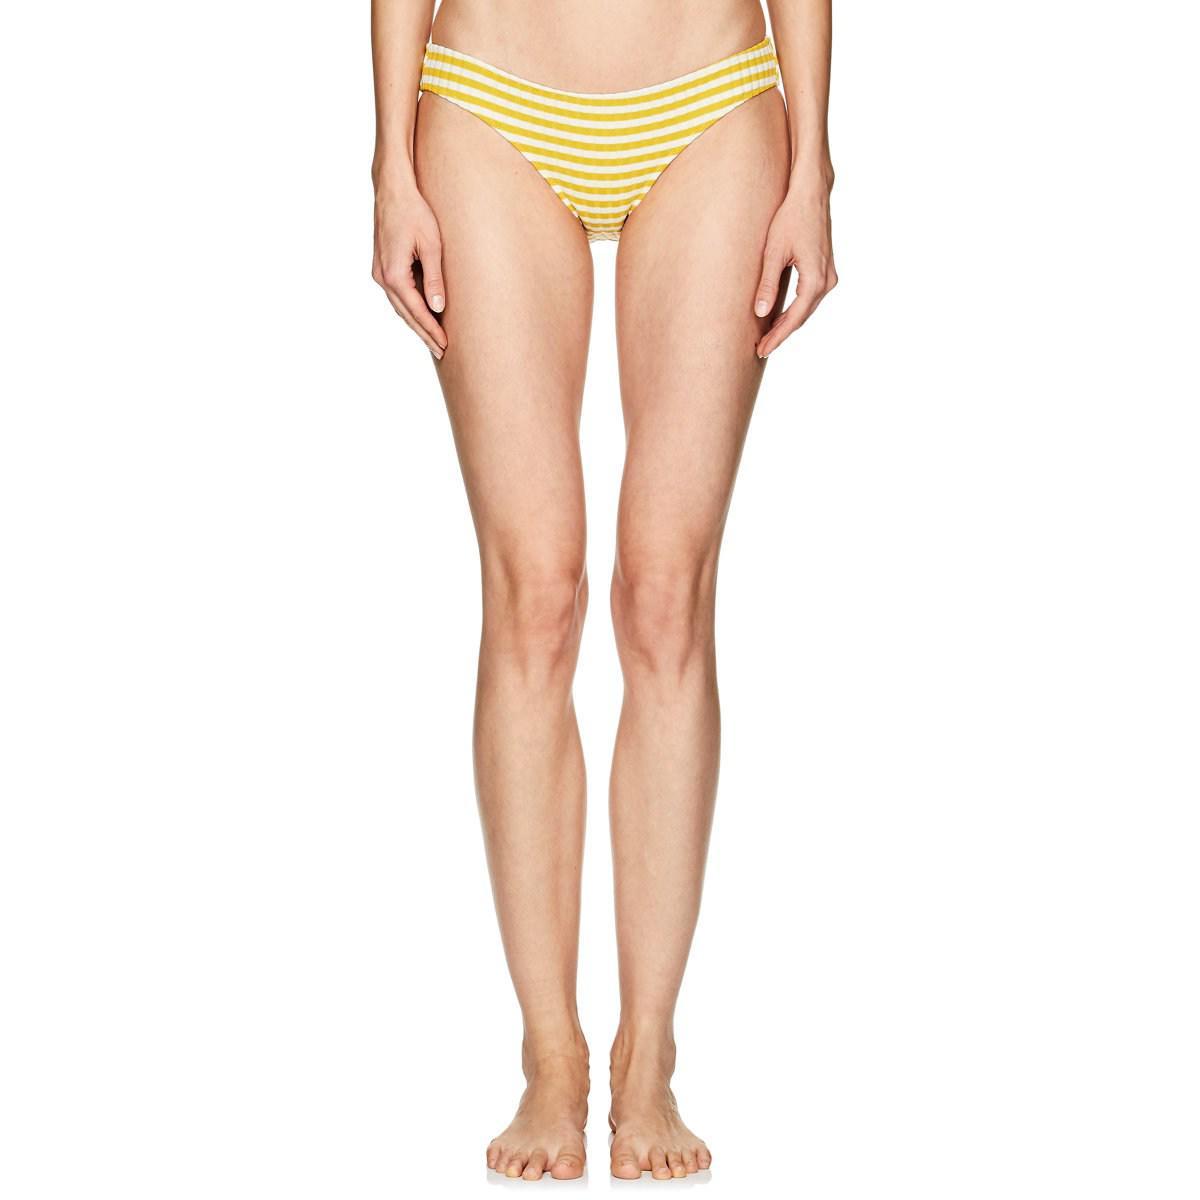 a4db4fa70165 Lyst - Solid   Striped Elle Striped Rib-knit Bikini Bottom - Save 70%